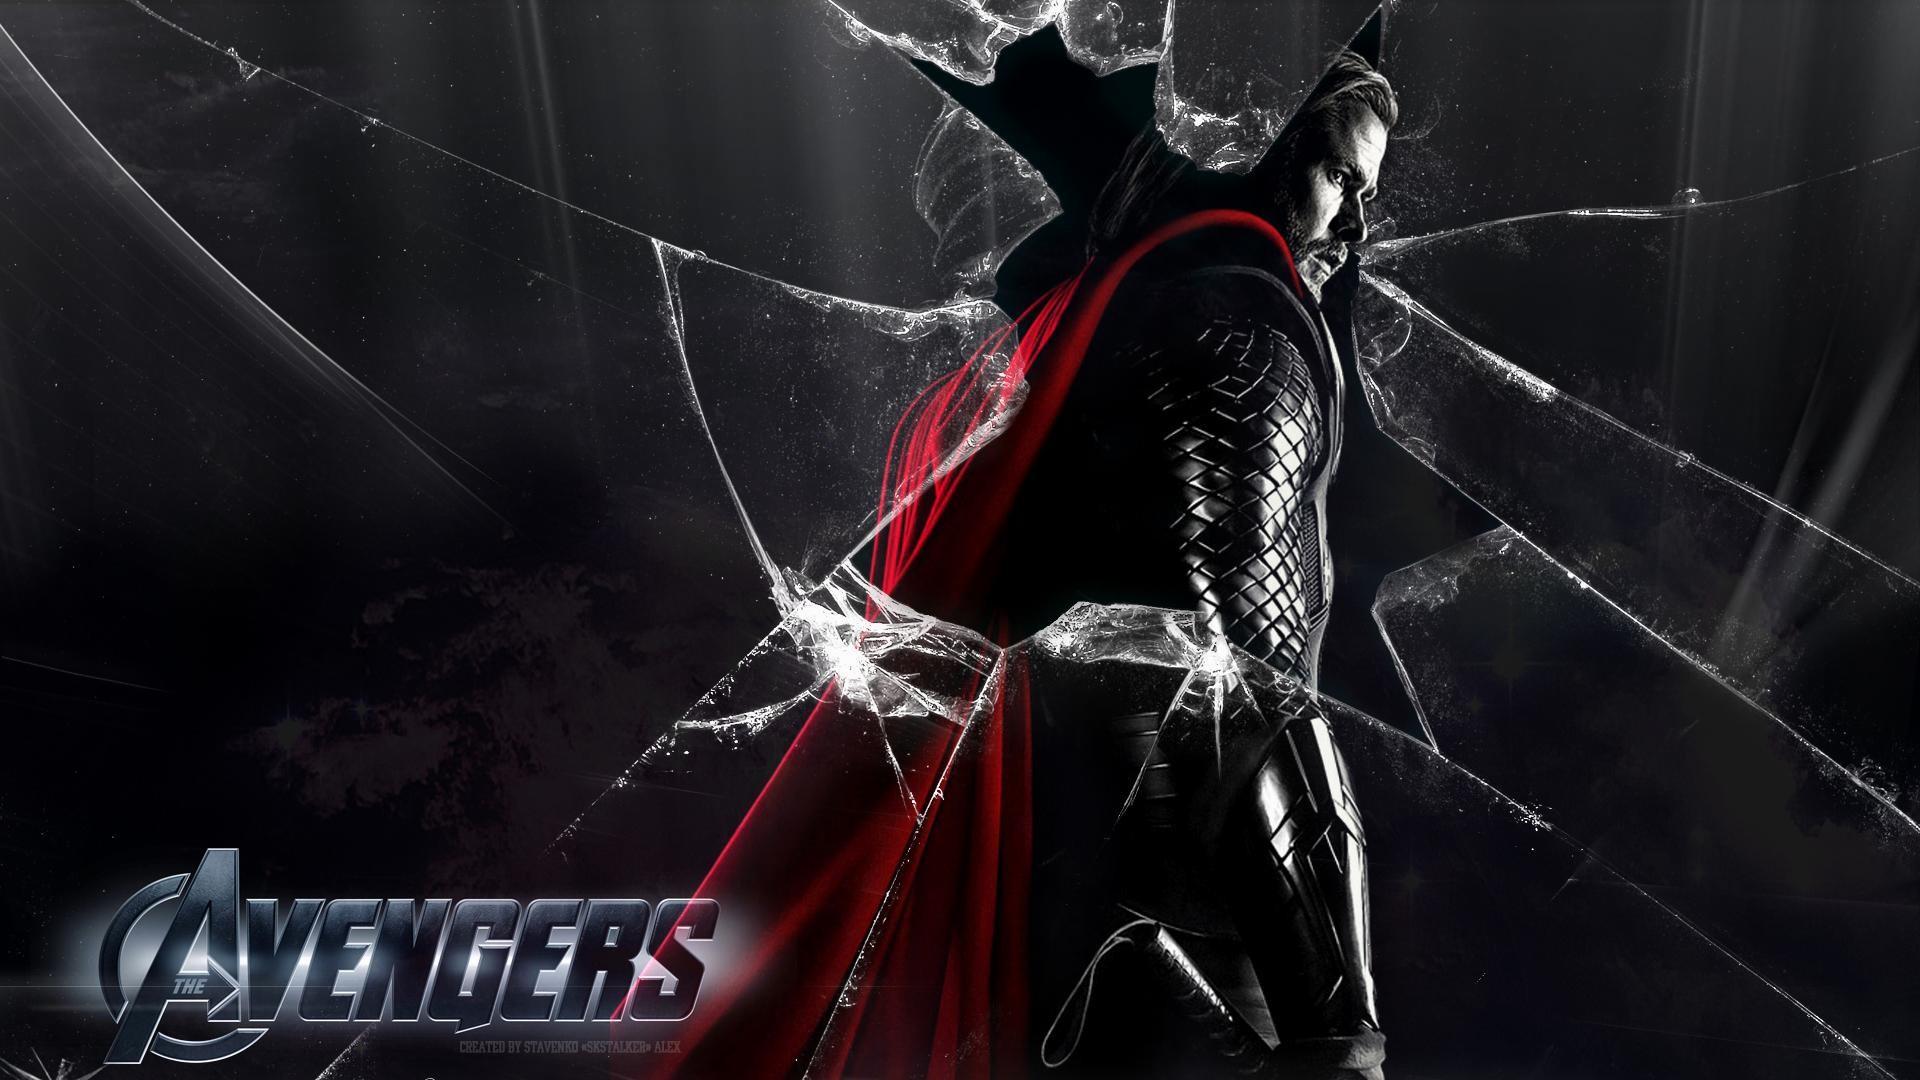 wallpaper.wiki-Thor-Wallpaper-PC-PIC-WPE007846